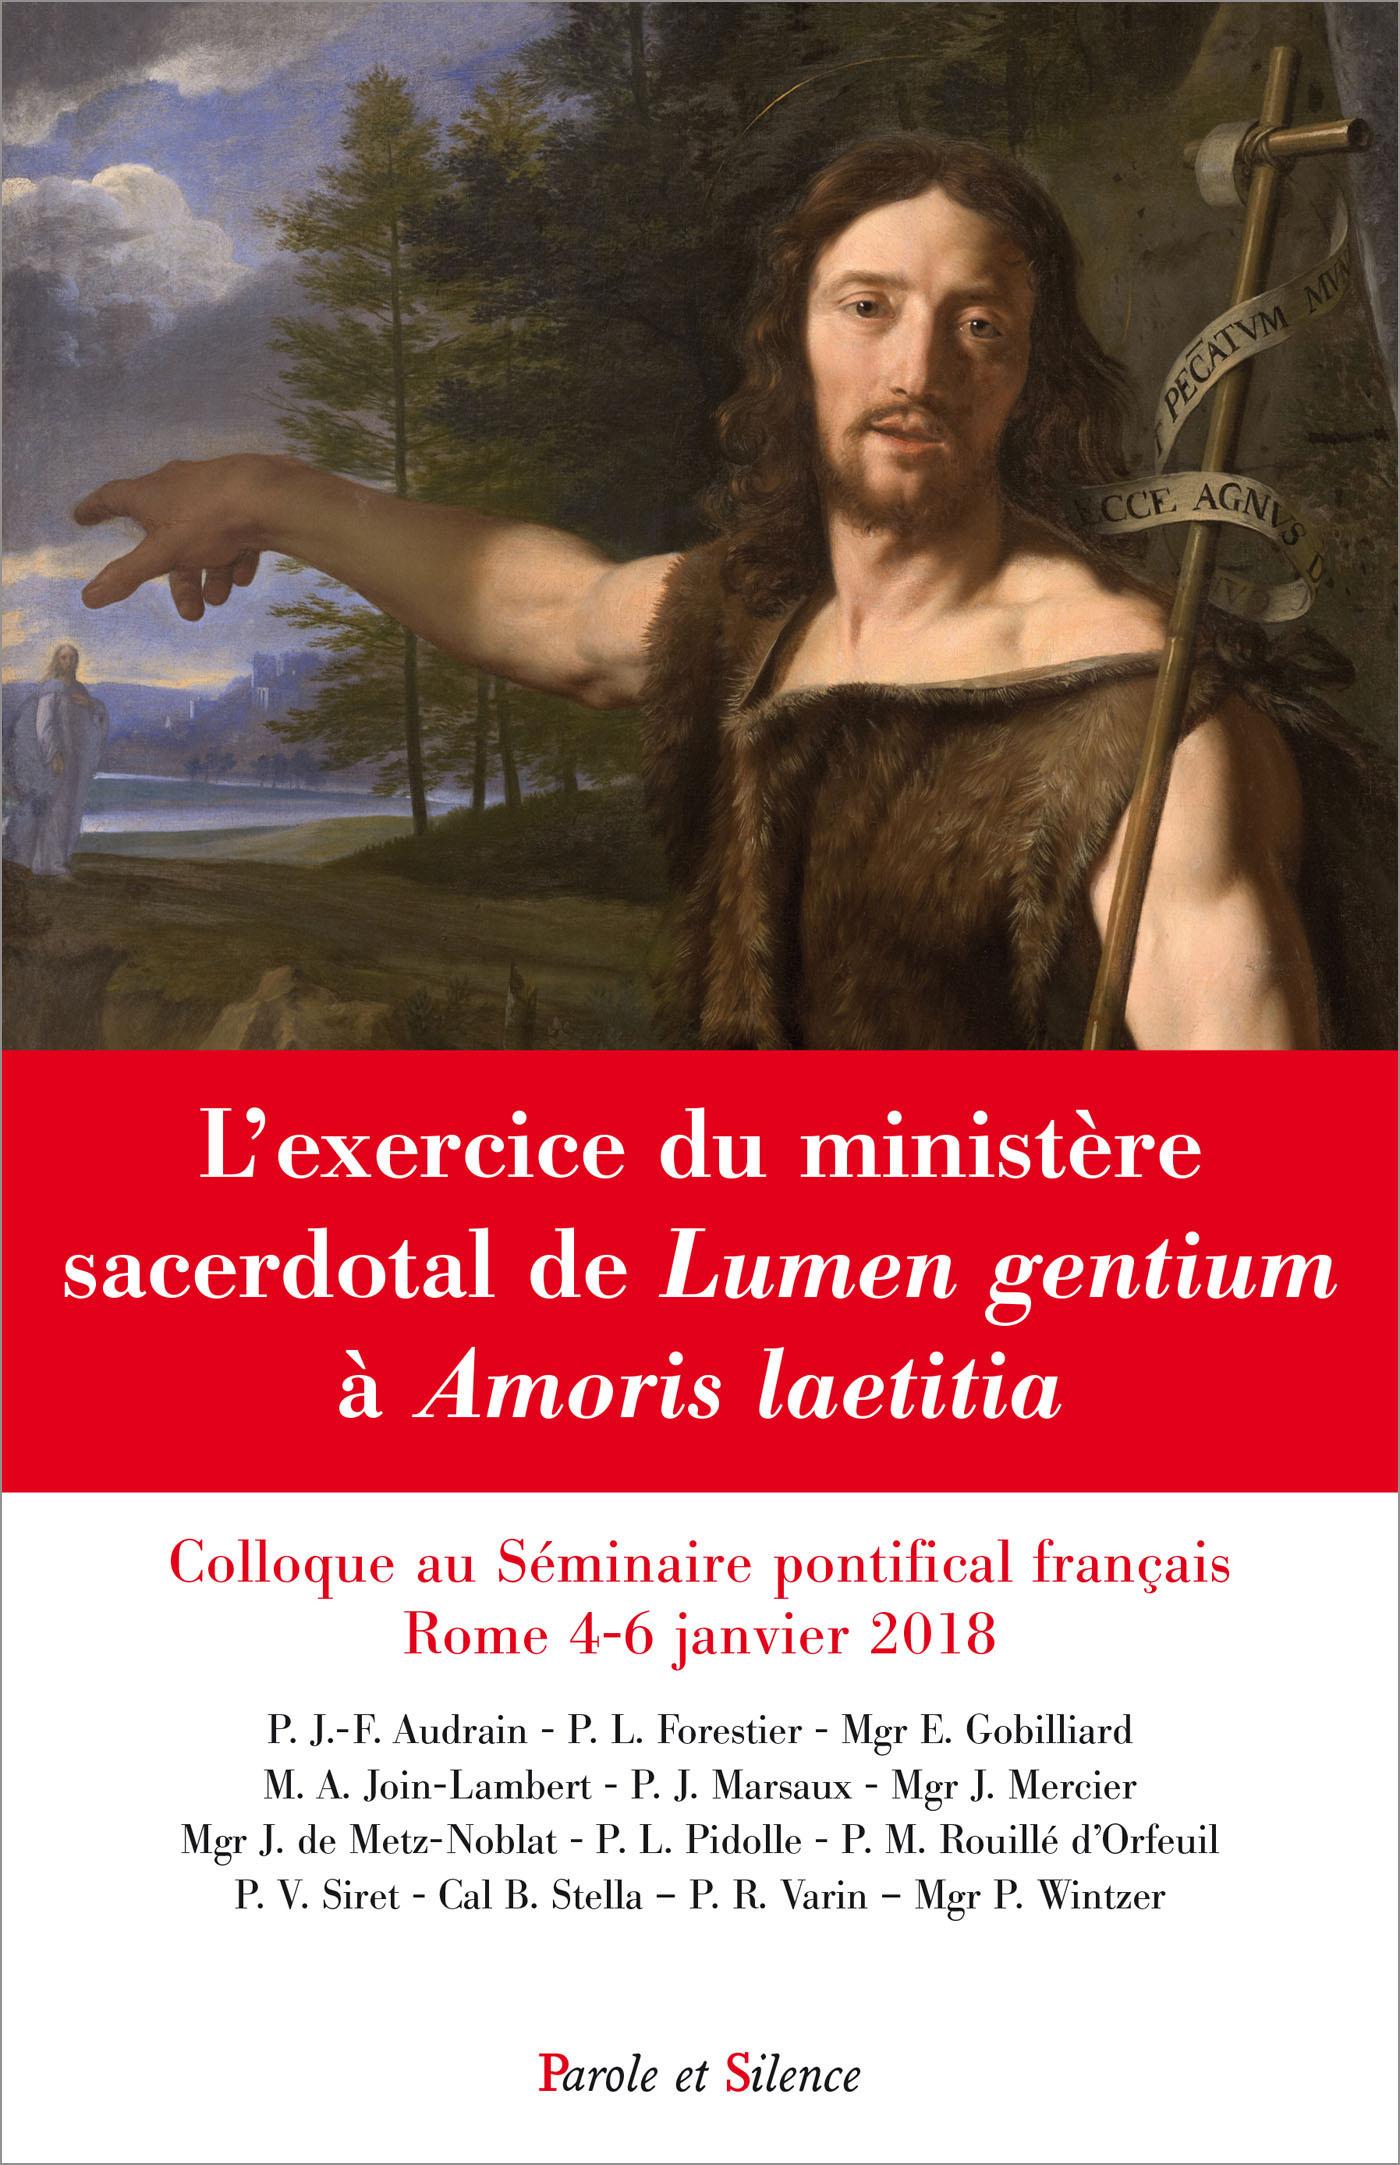 L'exercice du ministère sacerdotal de Lumen gentium à Amoris laetitia